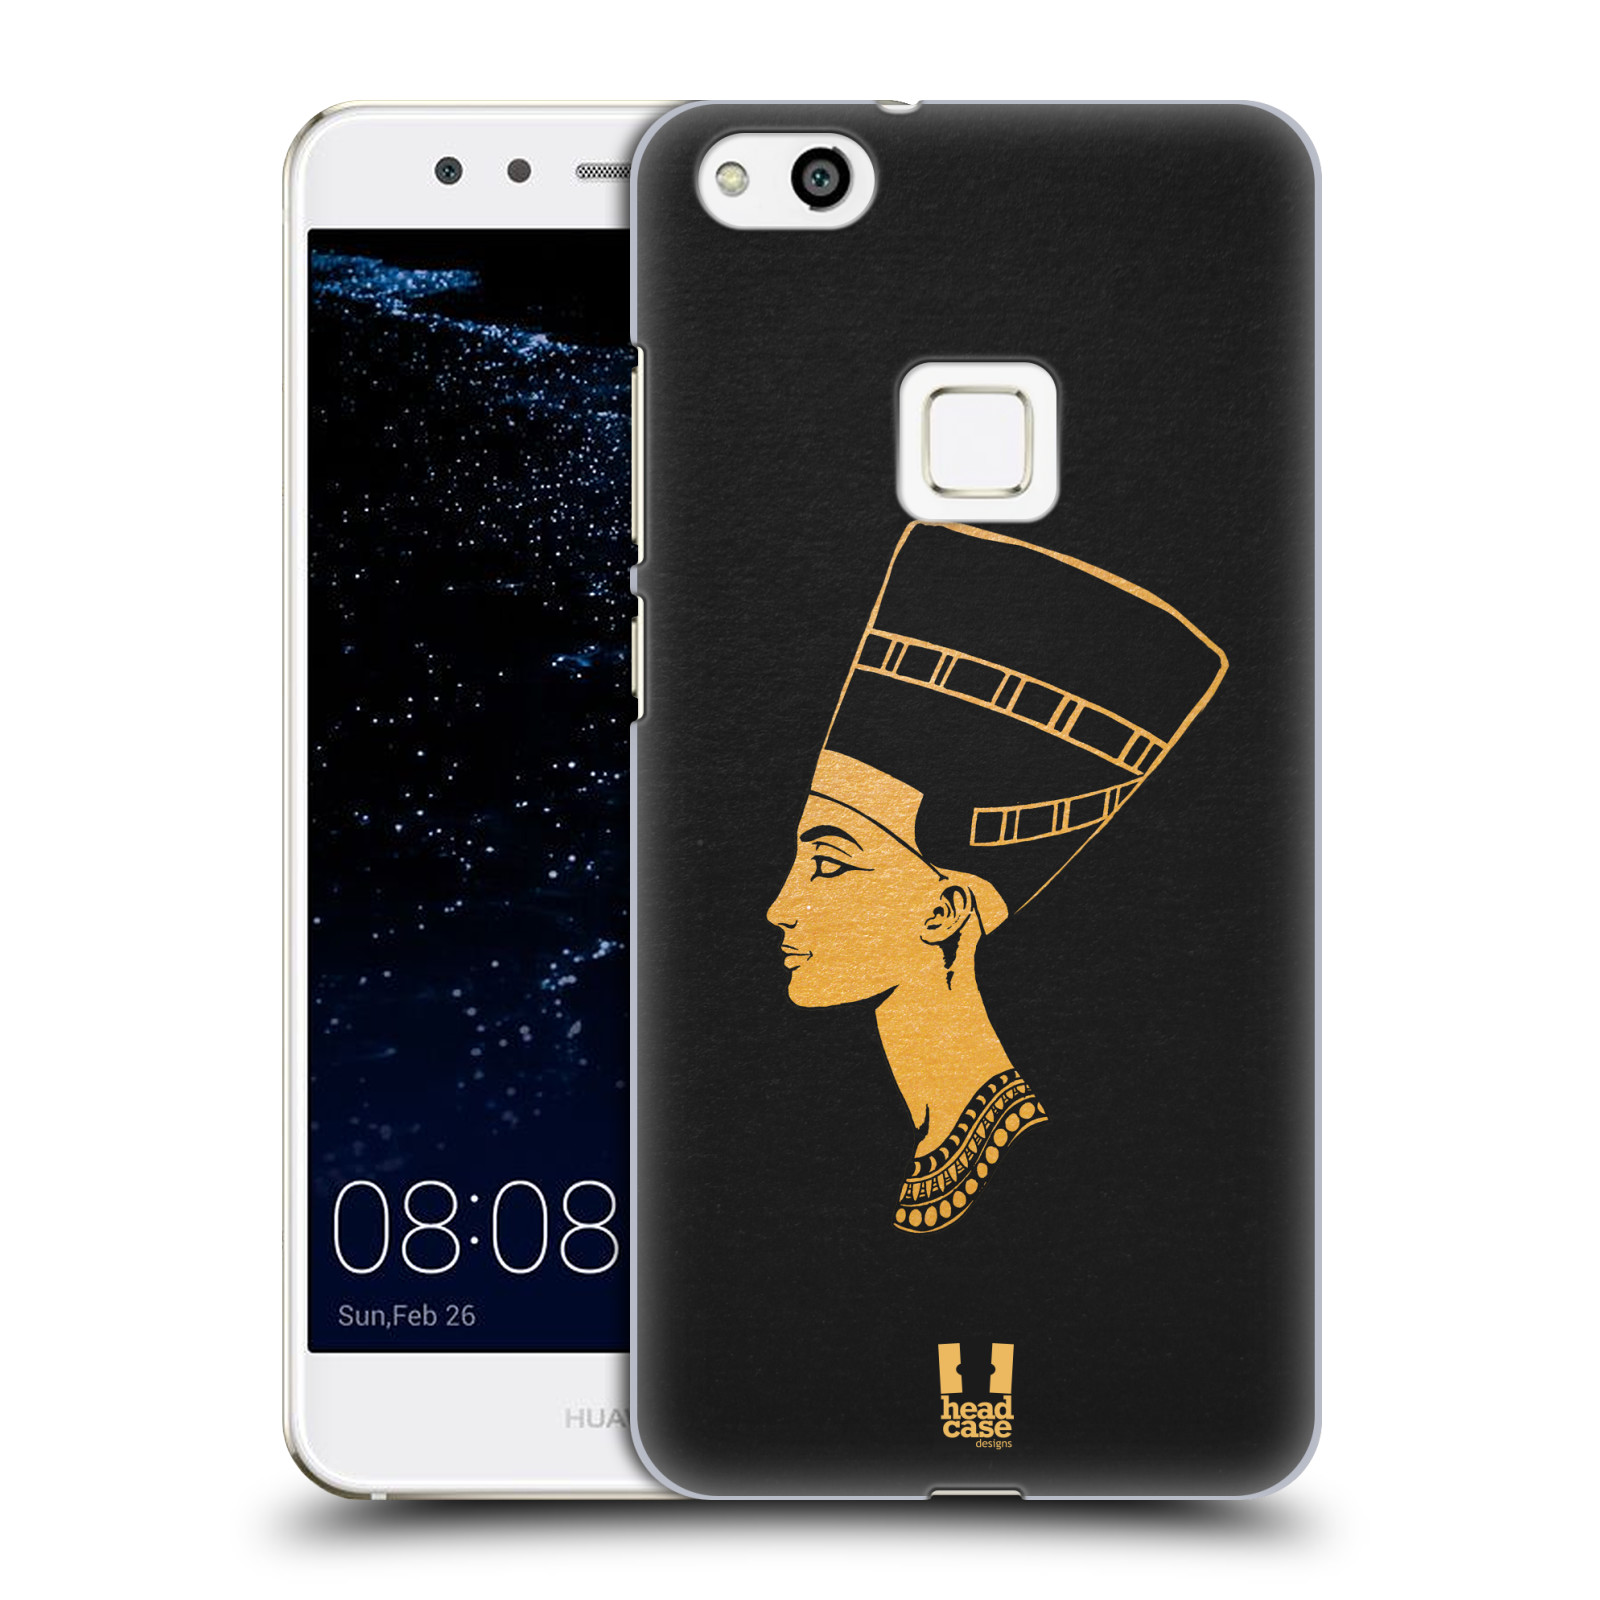 Plastové pouzdro na mobil Huawei P10 Lite Head Case - EGYPT NEFERTITI (Plastový kryt či obal na mobilní telefon Huawei P10 Lite Dual SIM (LX1/LX1A))